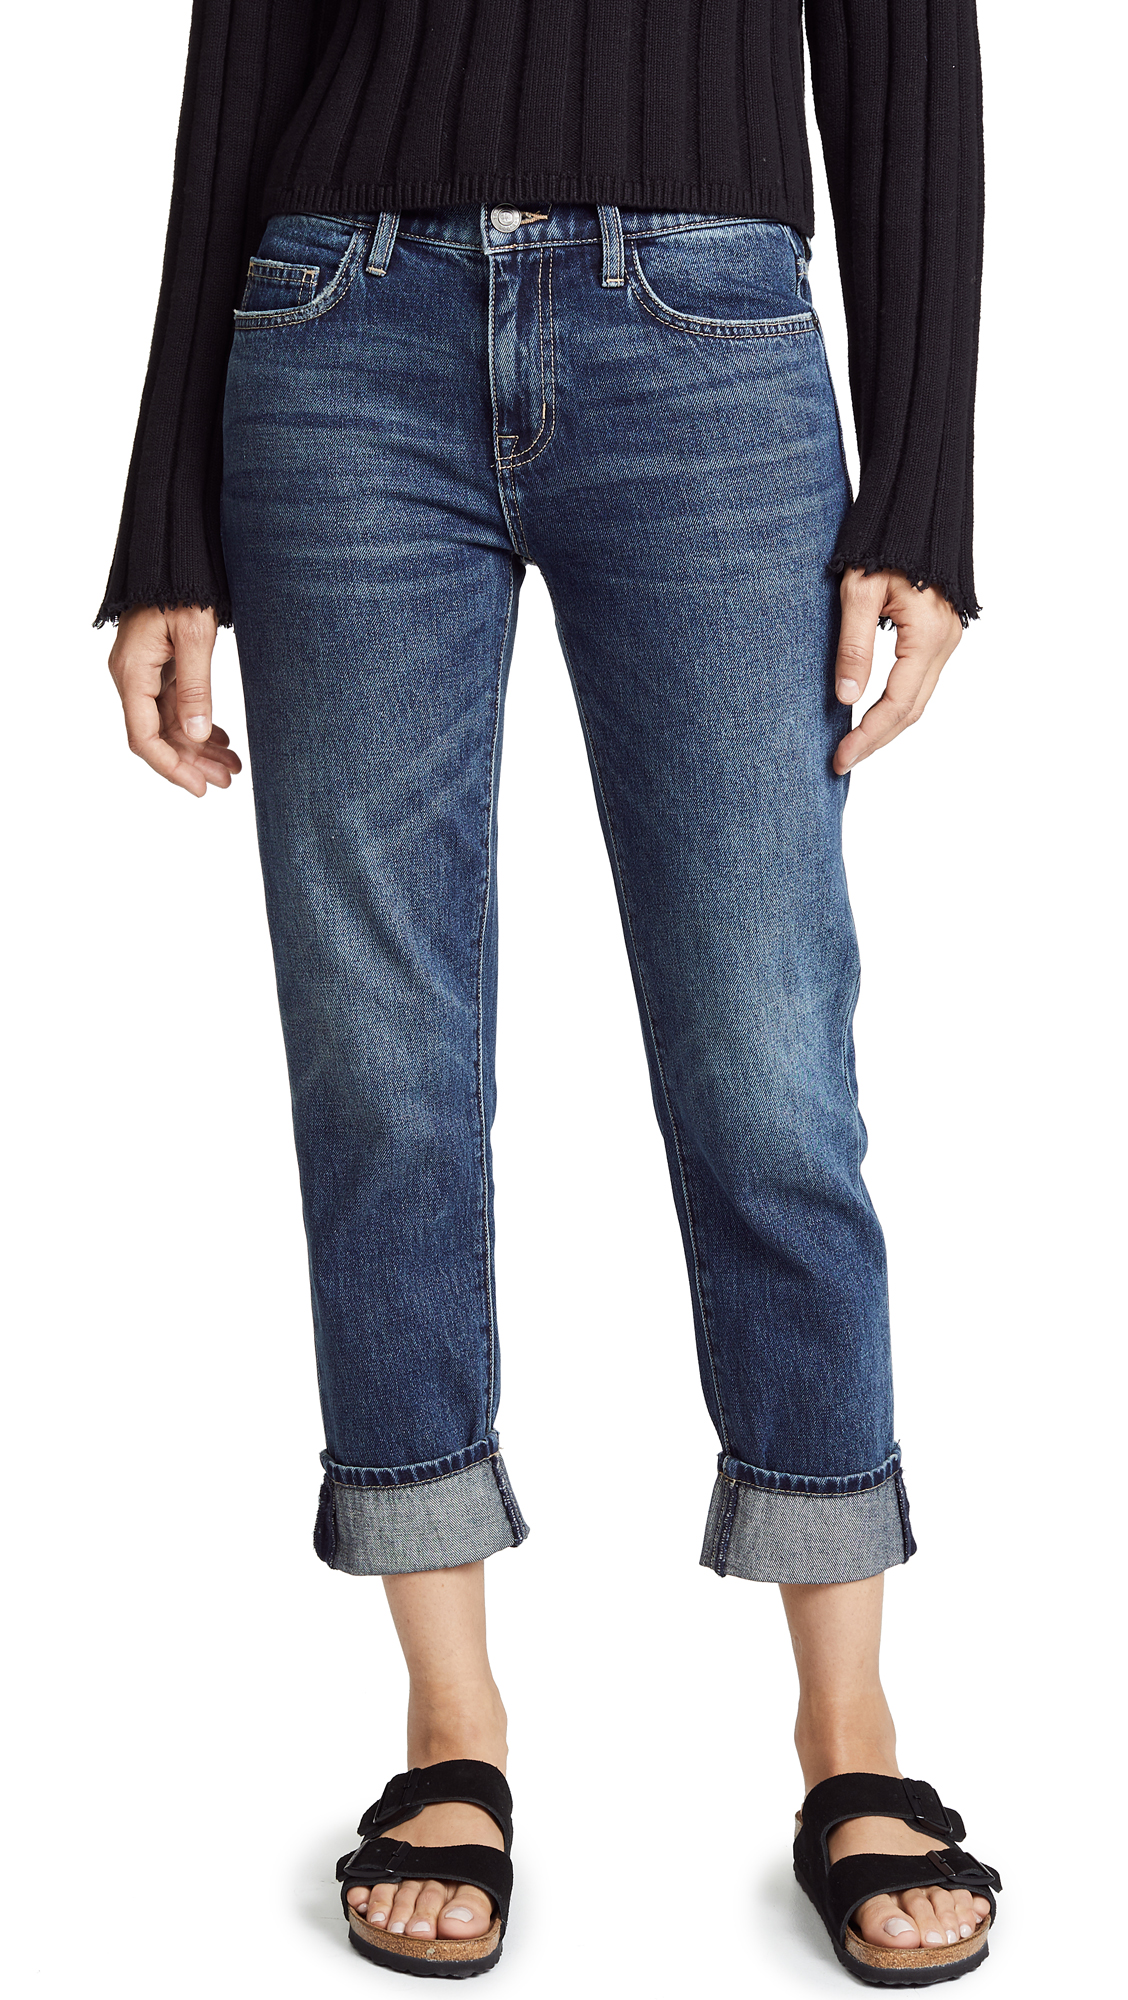 Current/Elliott The Fling Jeans - 1 Year Worn Rigid Indigo